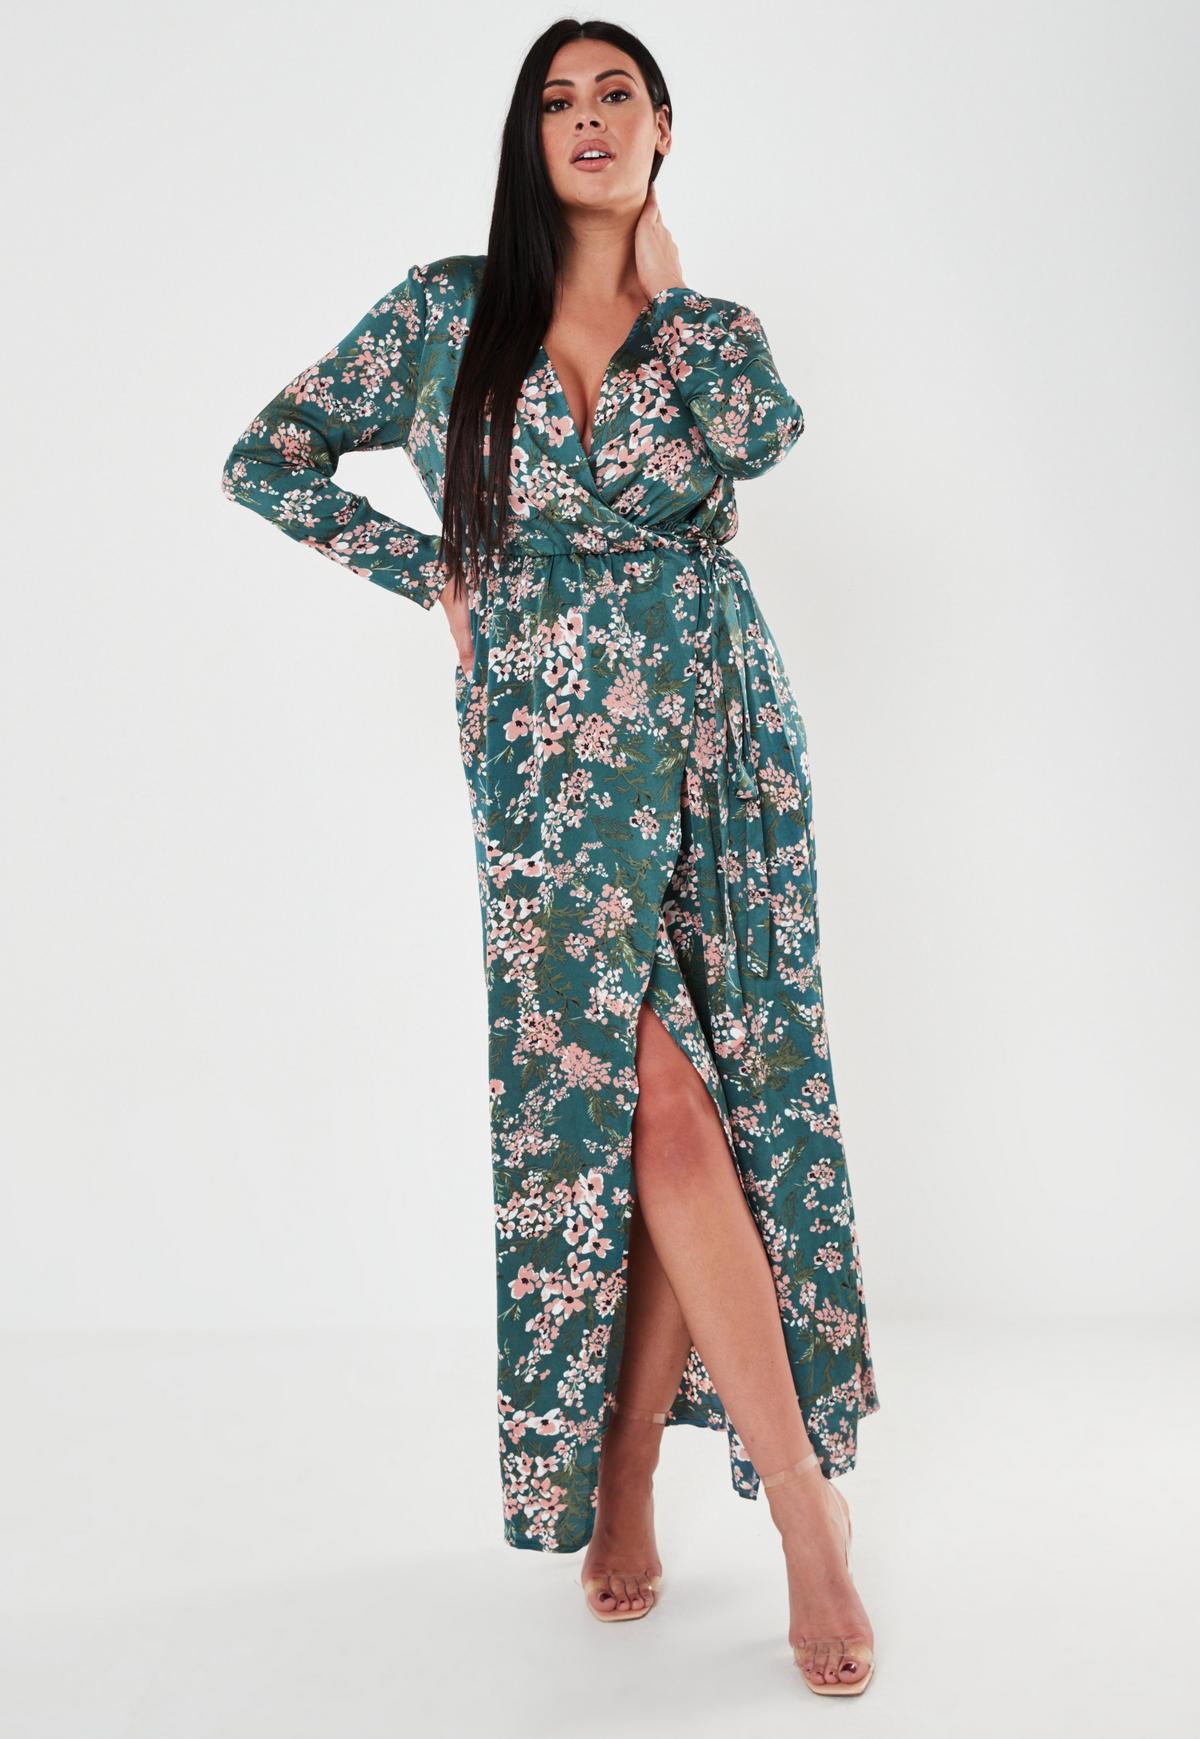 Plus Size Smocked Floral Maxi Sundress | Floral maxi, Plus